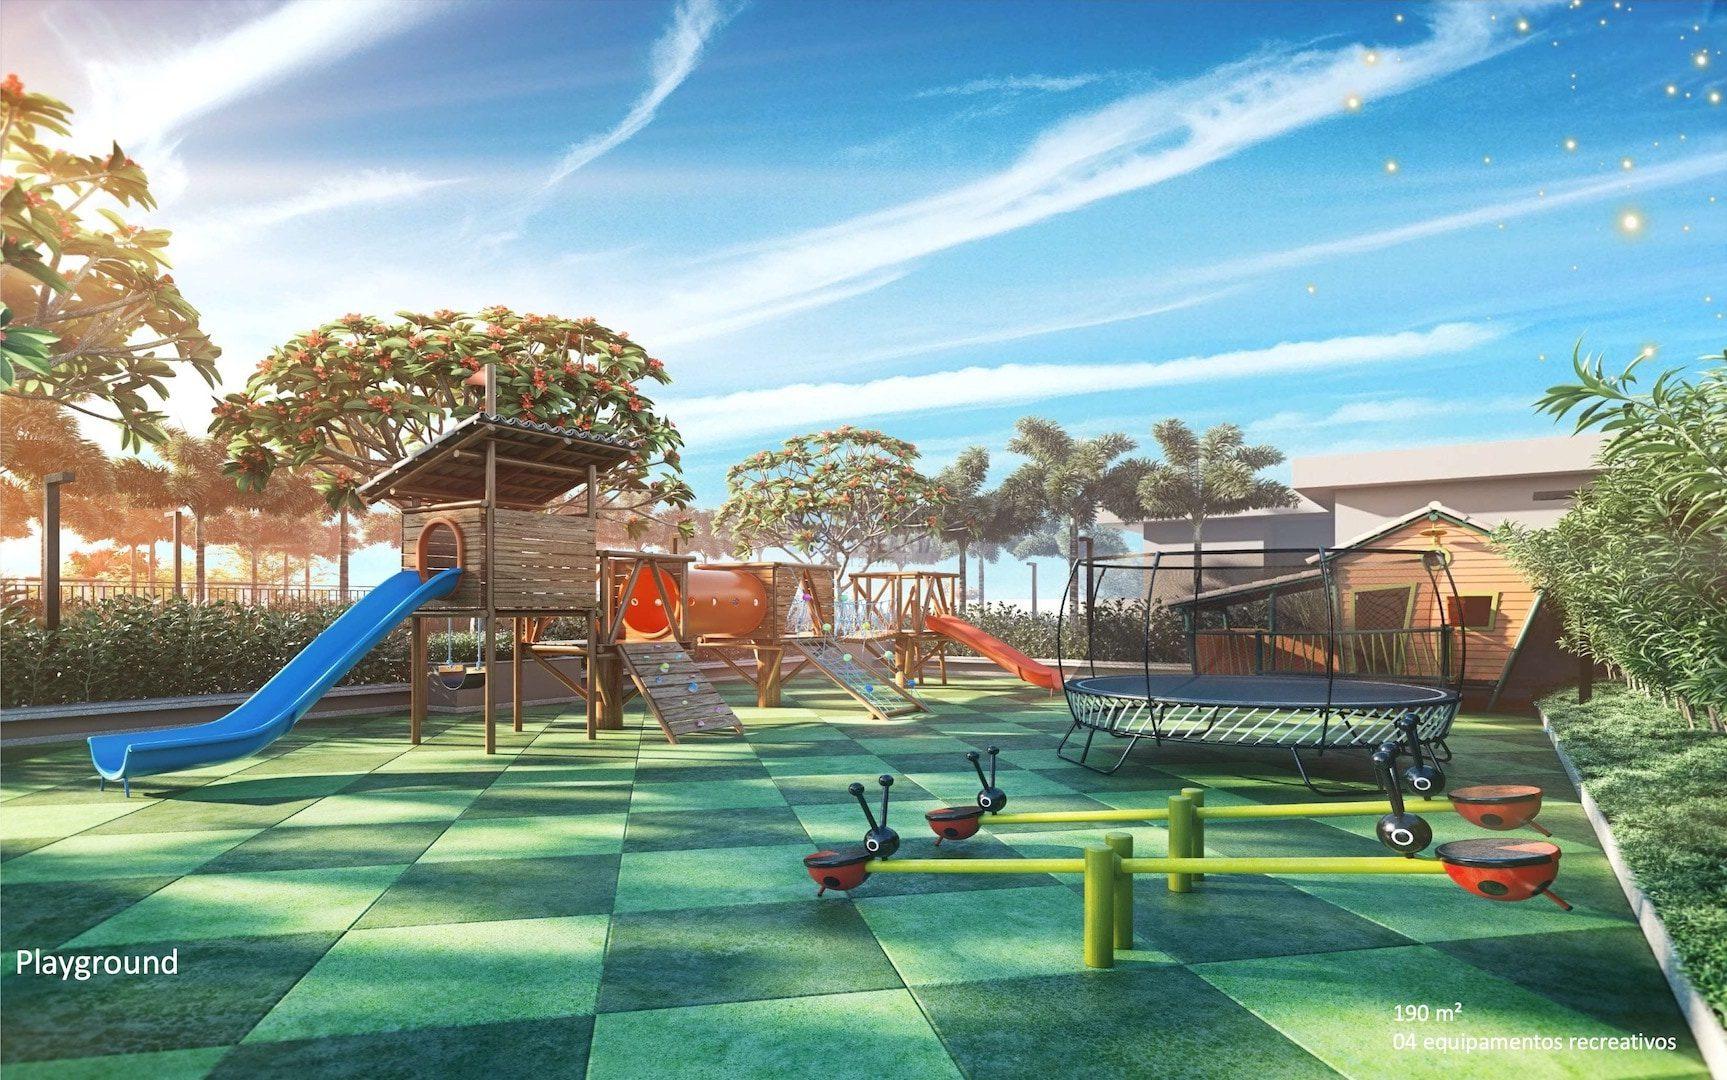 Living Grand Wish Nova Campinas Playground